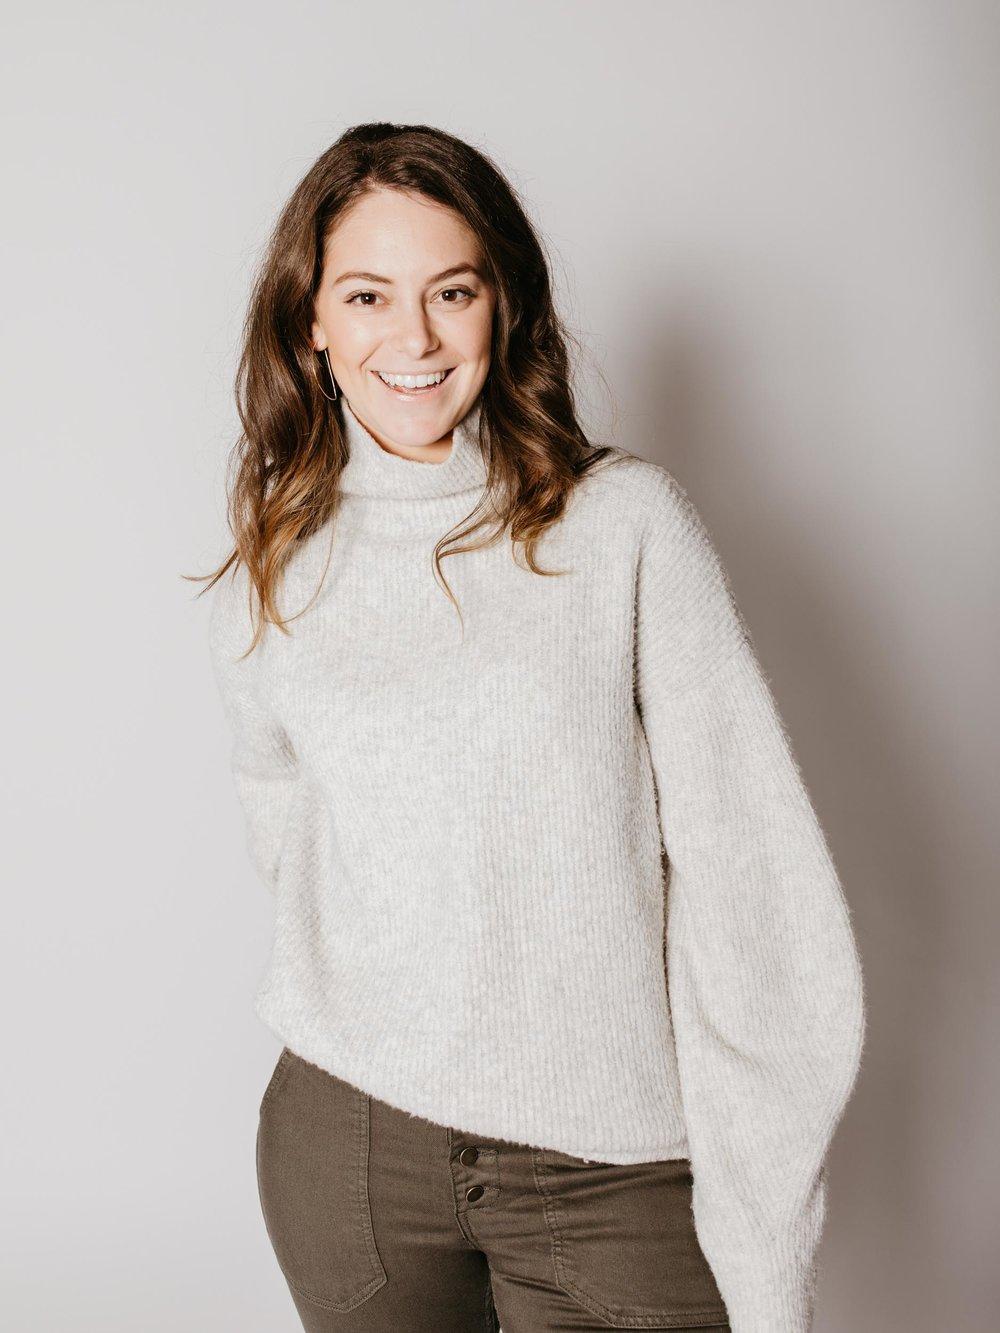 Zoe Kahn - Content Creator